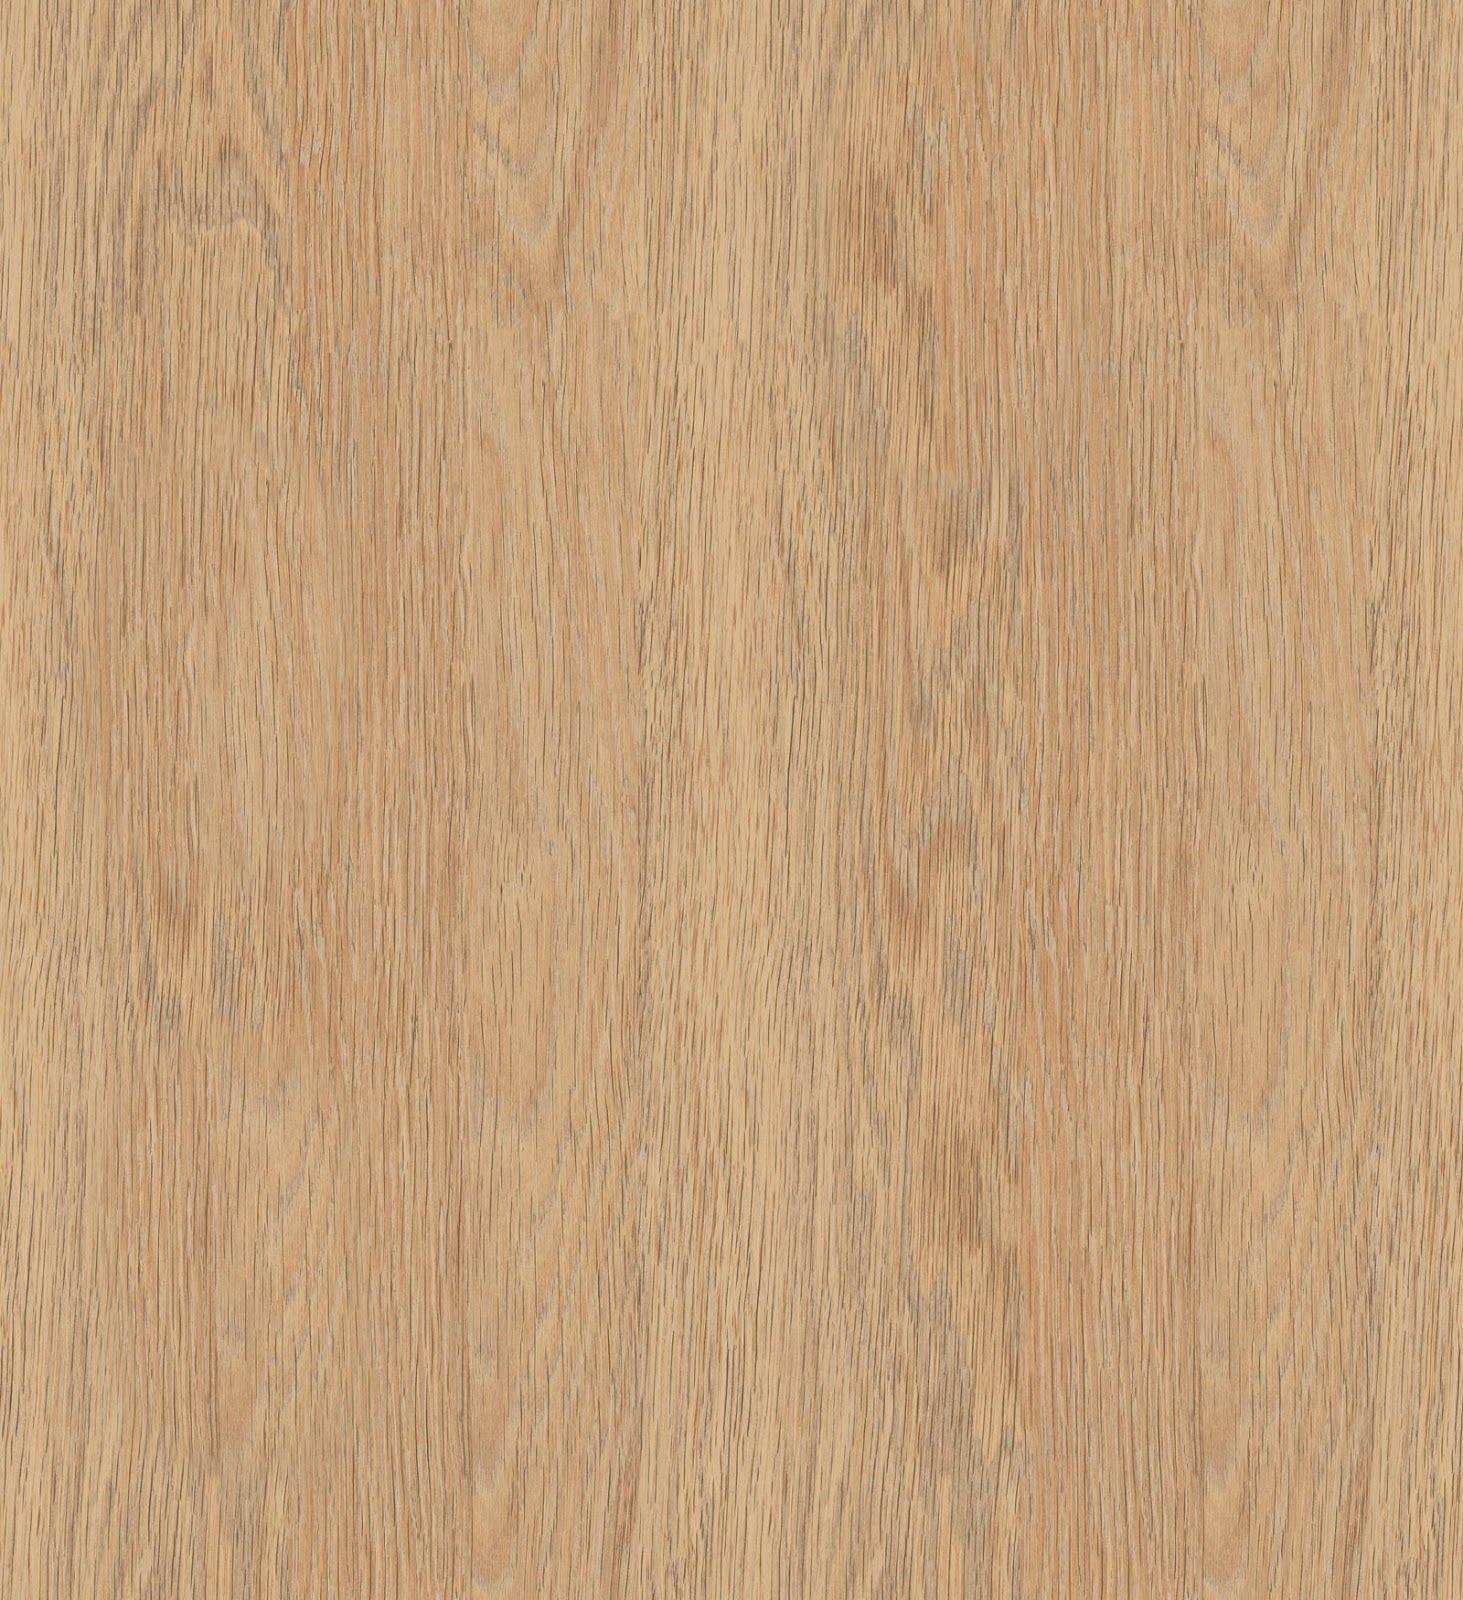 Seamless Wood Fine Sabbia Texture | Texturise Free Seamless Textures With Maps #woodtextureseamless